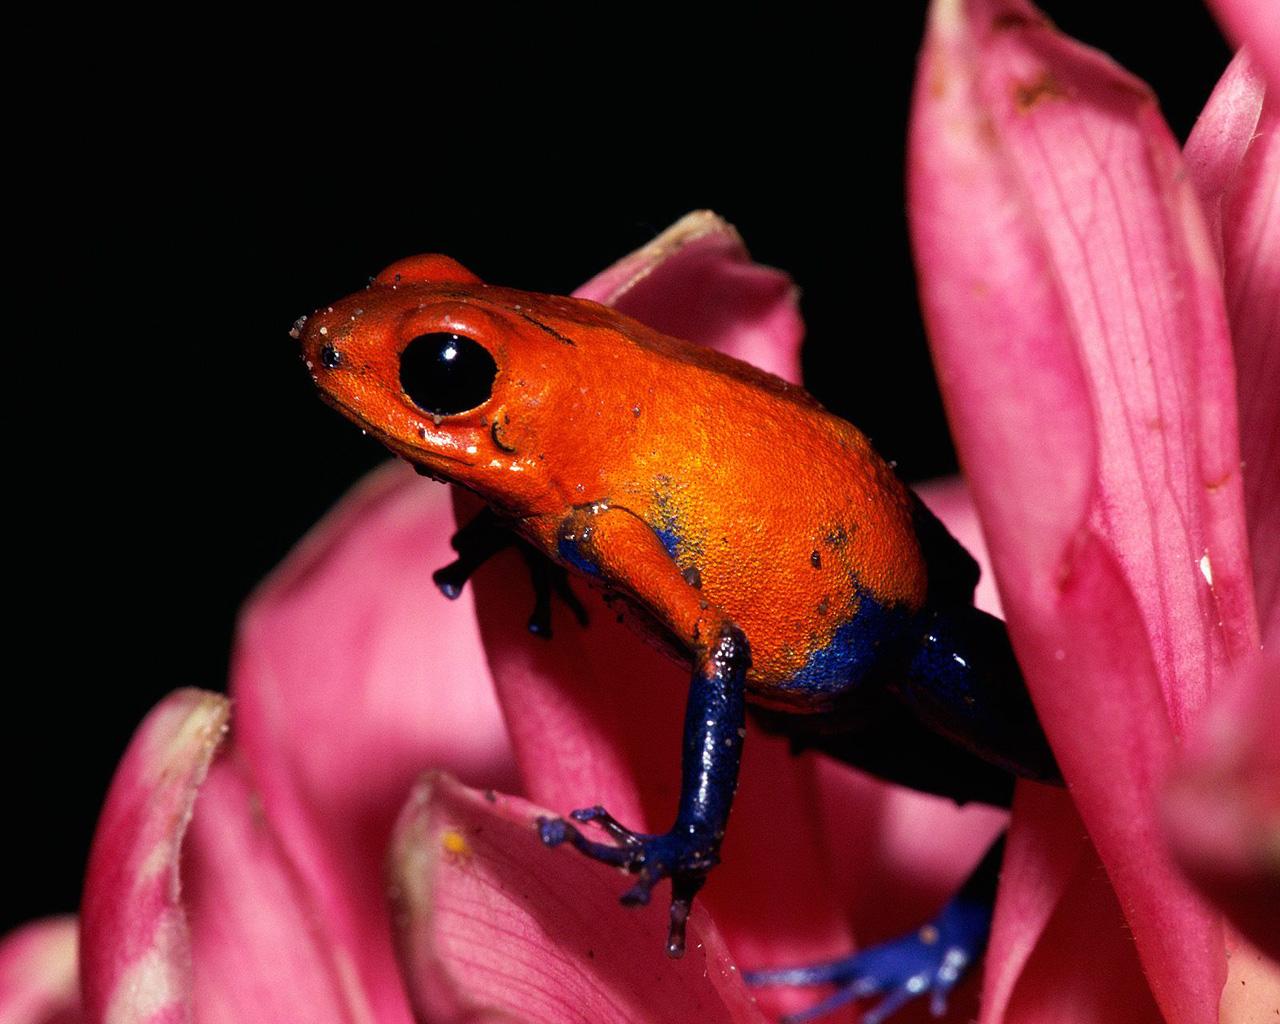 http://3.bp.blogspot.com/-SXQfFj6Uuyg/Tng1vOnsAKI/AAAAAAAAATg/d0NByIZhbwE/s1600/poison-dart-frog-wallpaper-3-724775.jpg